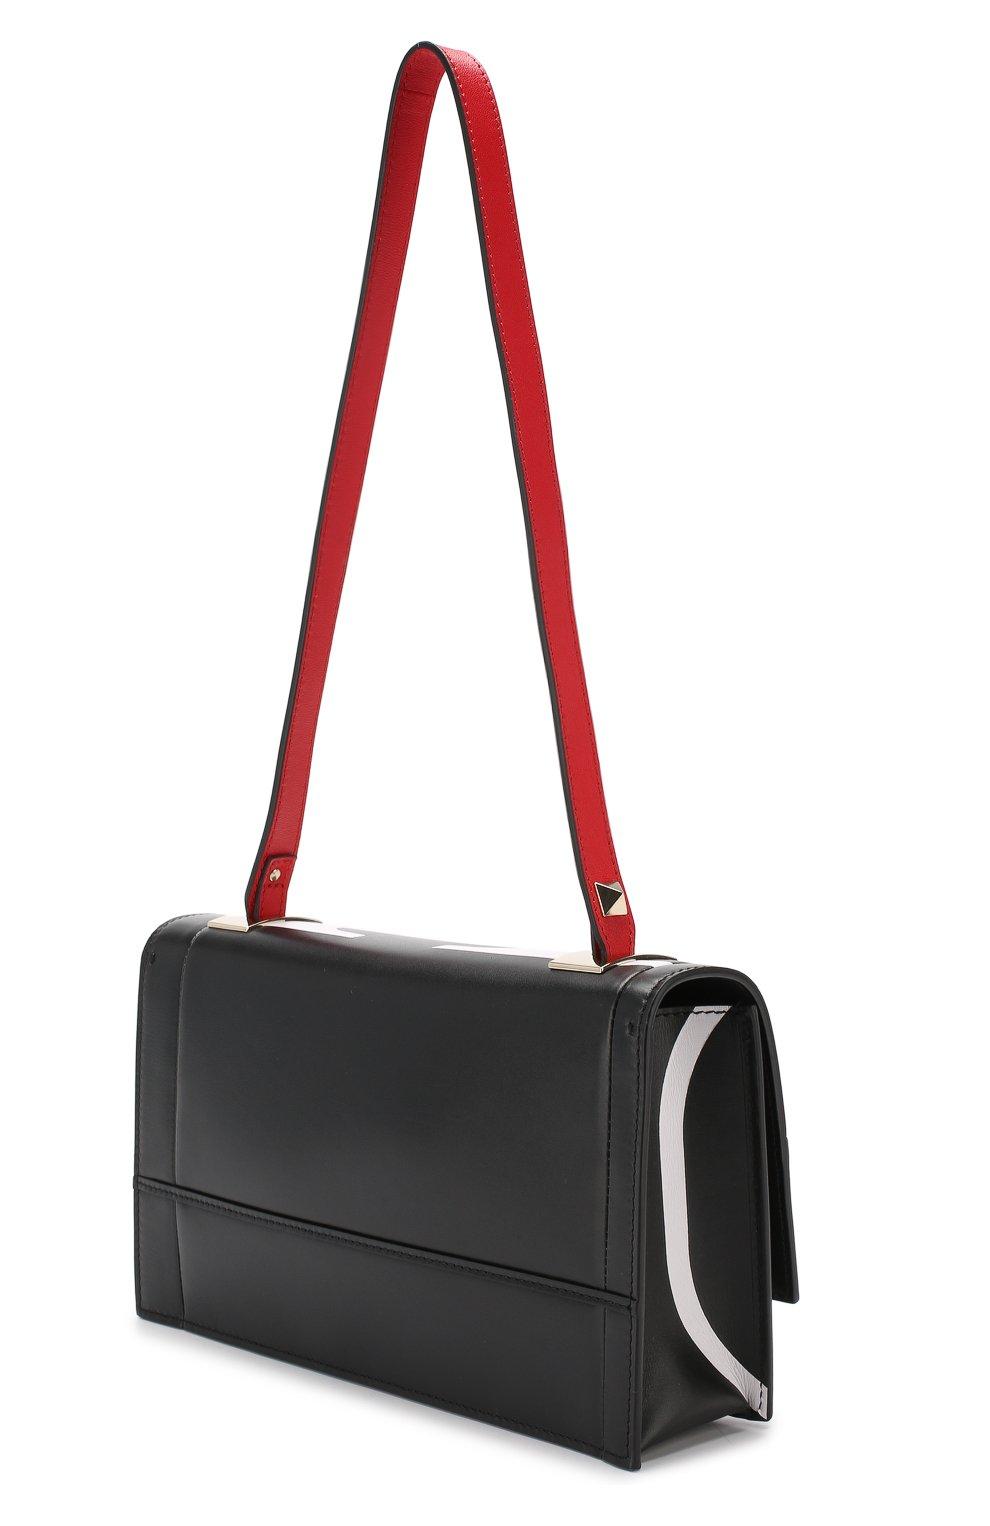 Сумка Valentino Garavani The Case Valentino черная цвета   Фото №3